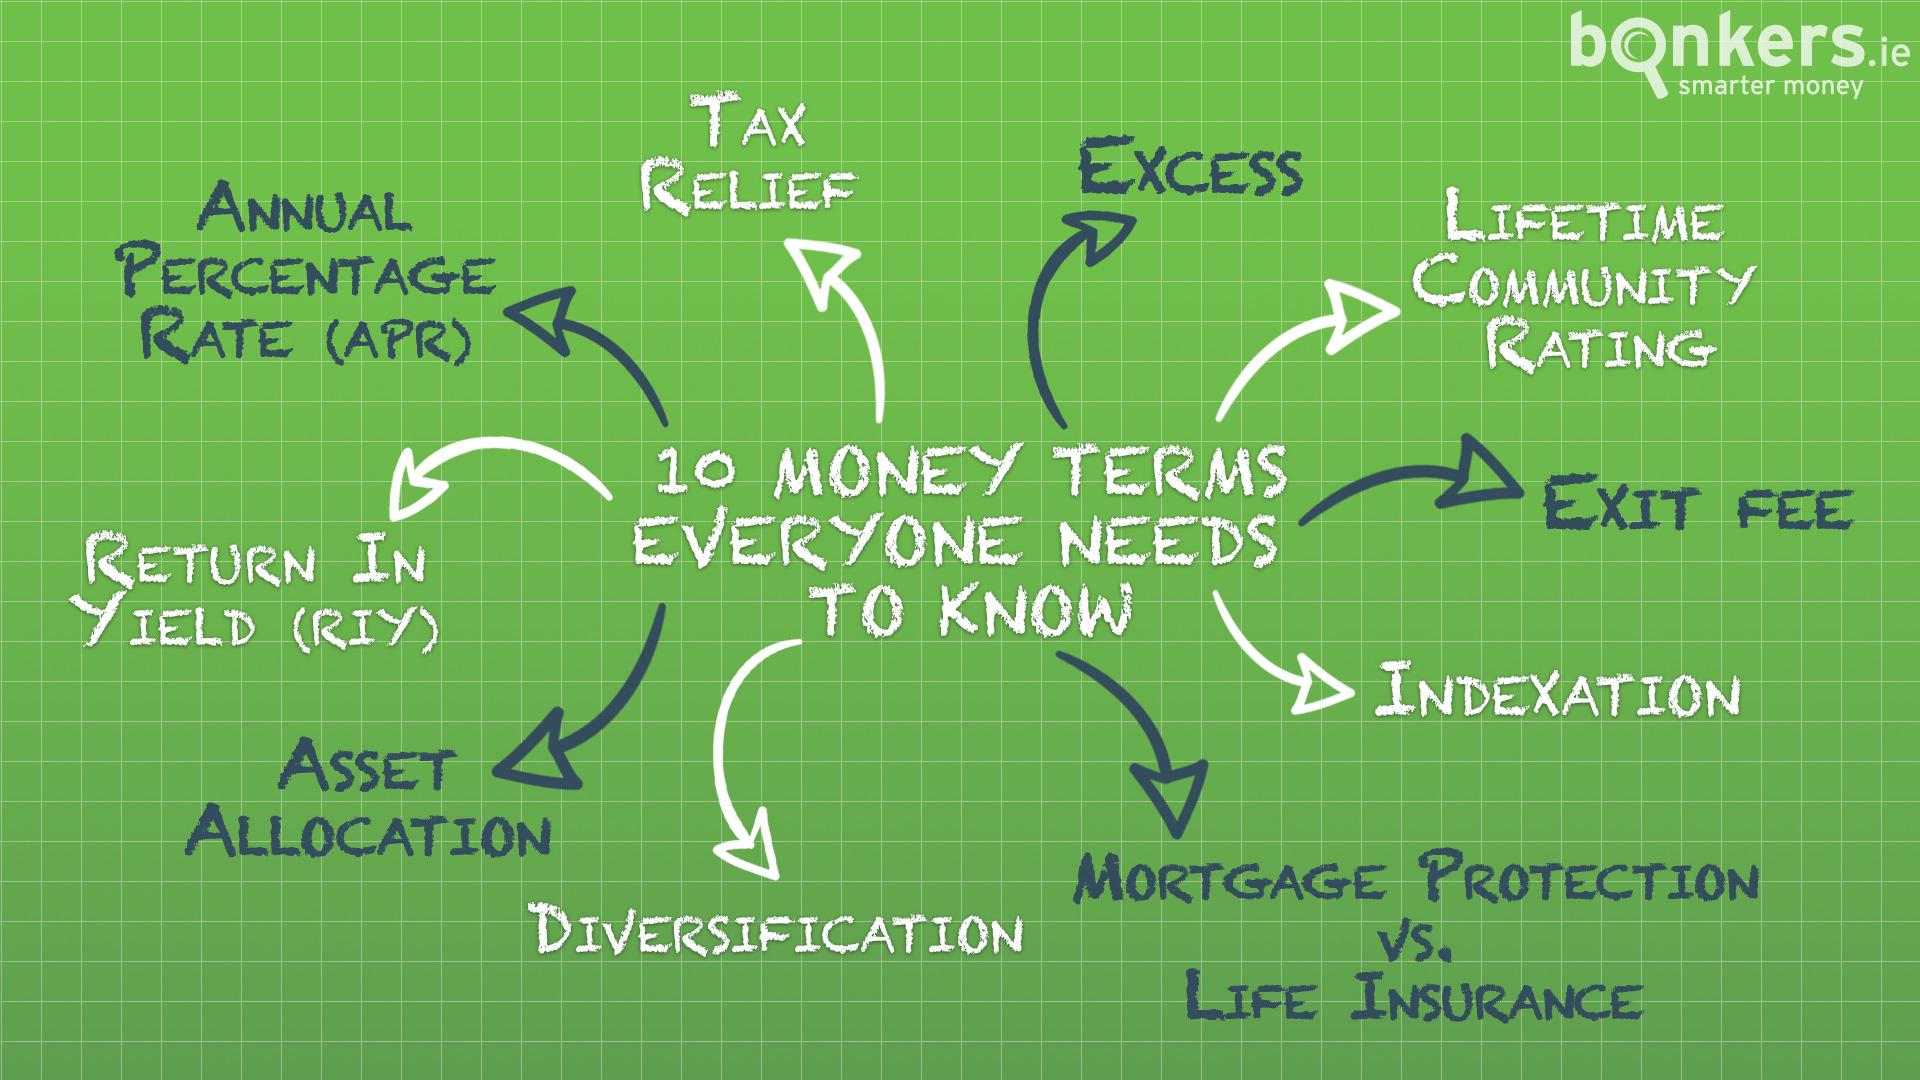 10 money terms everyone needs to know